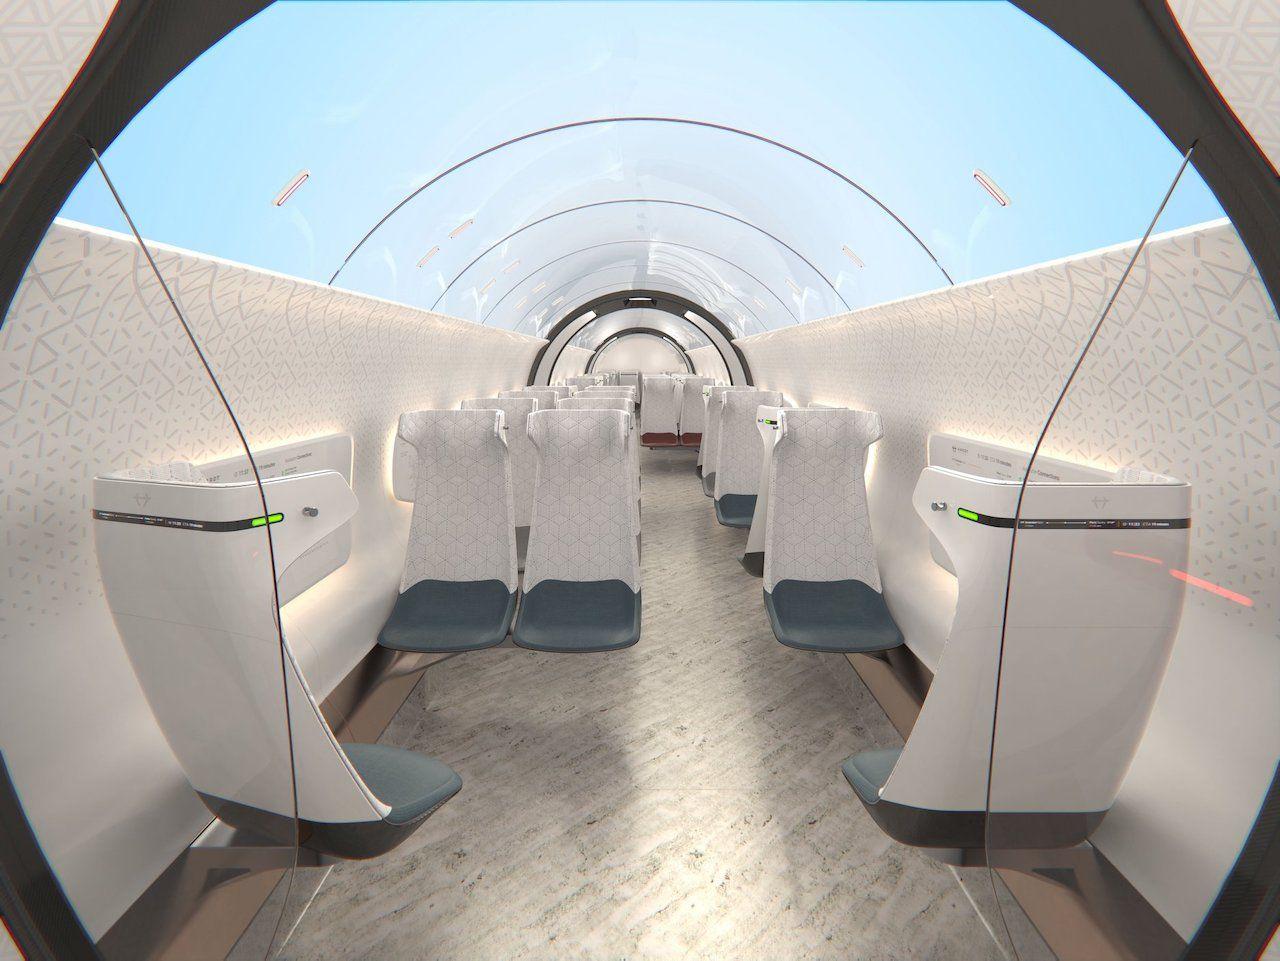 Hardt Hyperloop inside